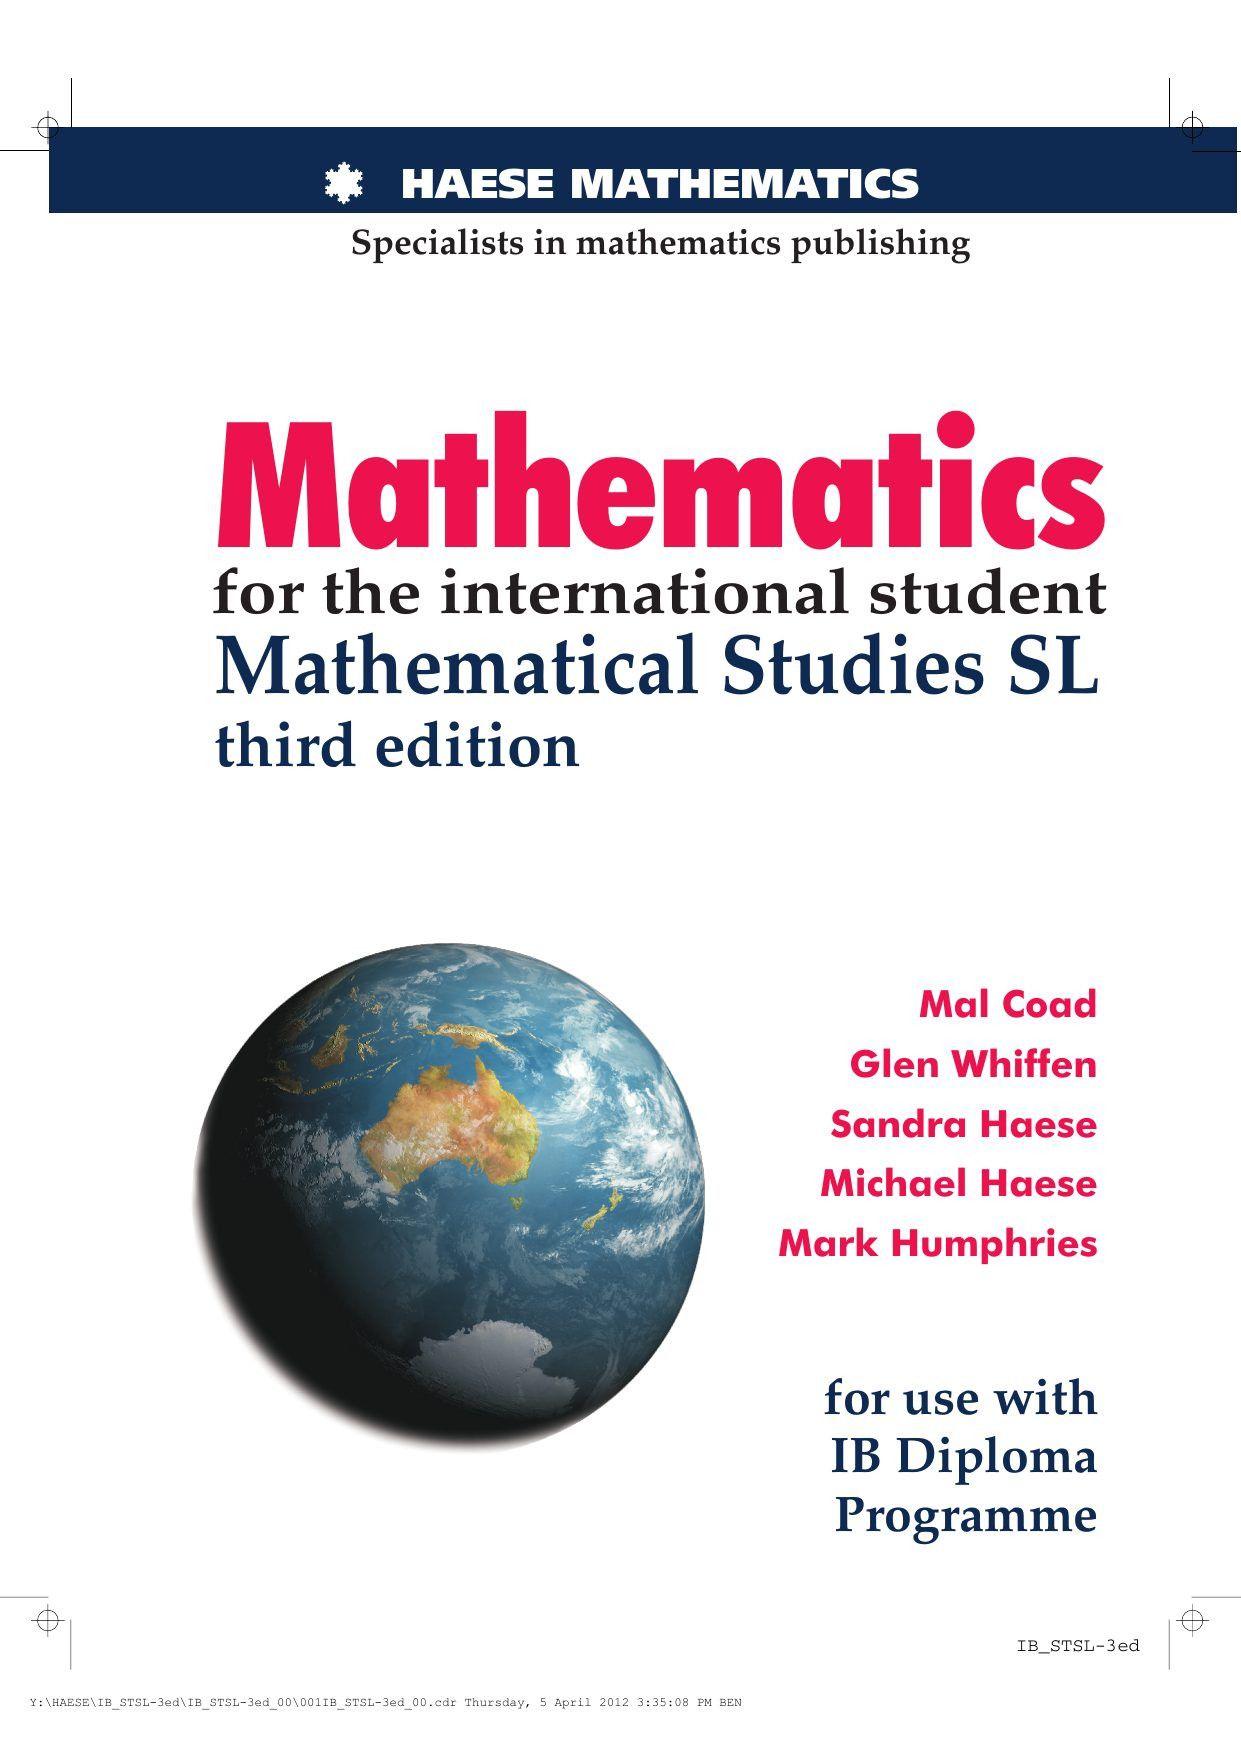 4 Free Math Worksheets Third Grade 3 Subtraction Subtract Borrow Across 3 Zeros 1 4315c699e30